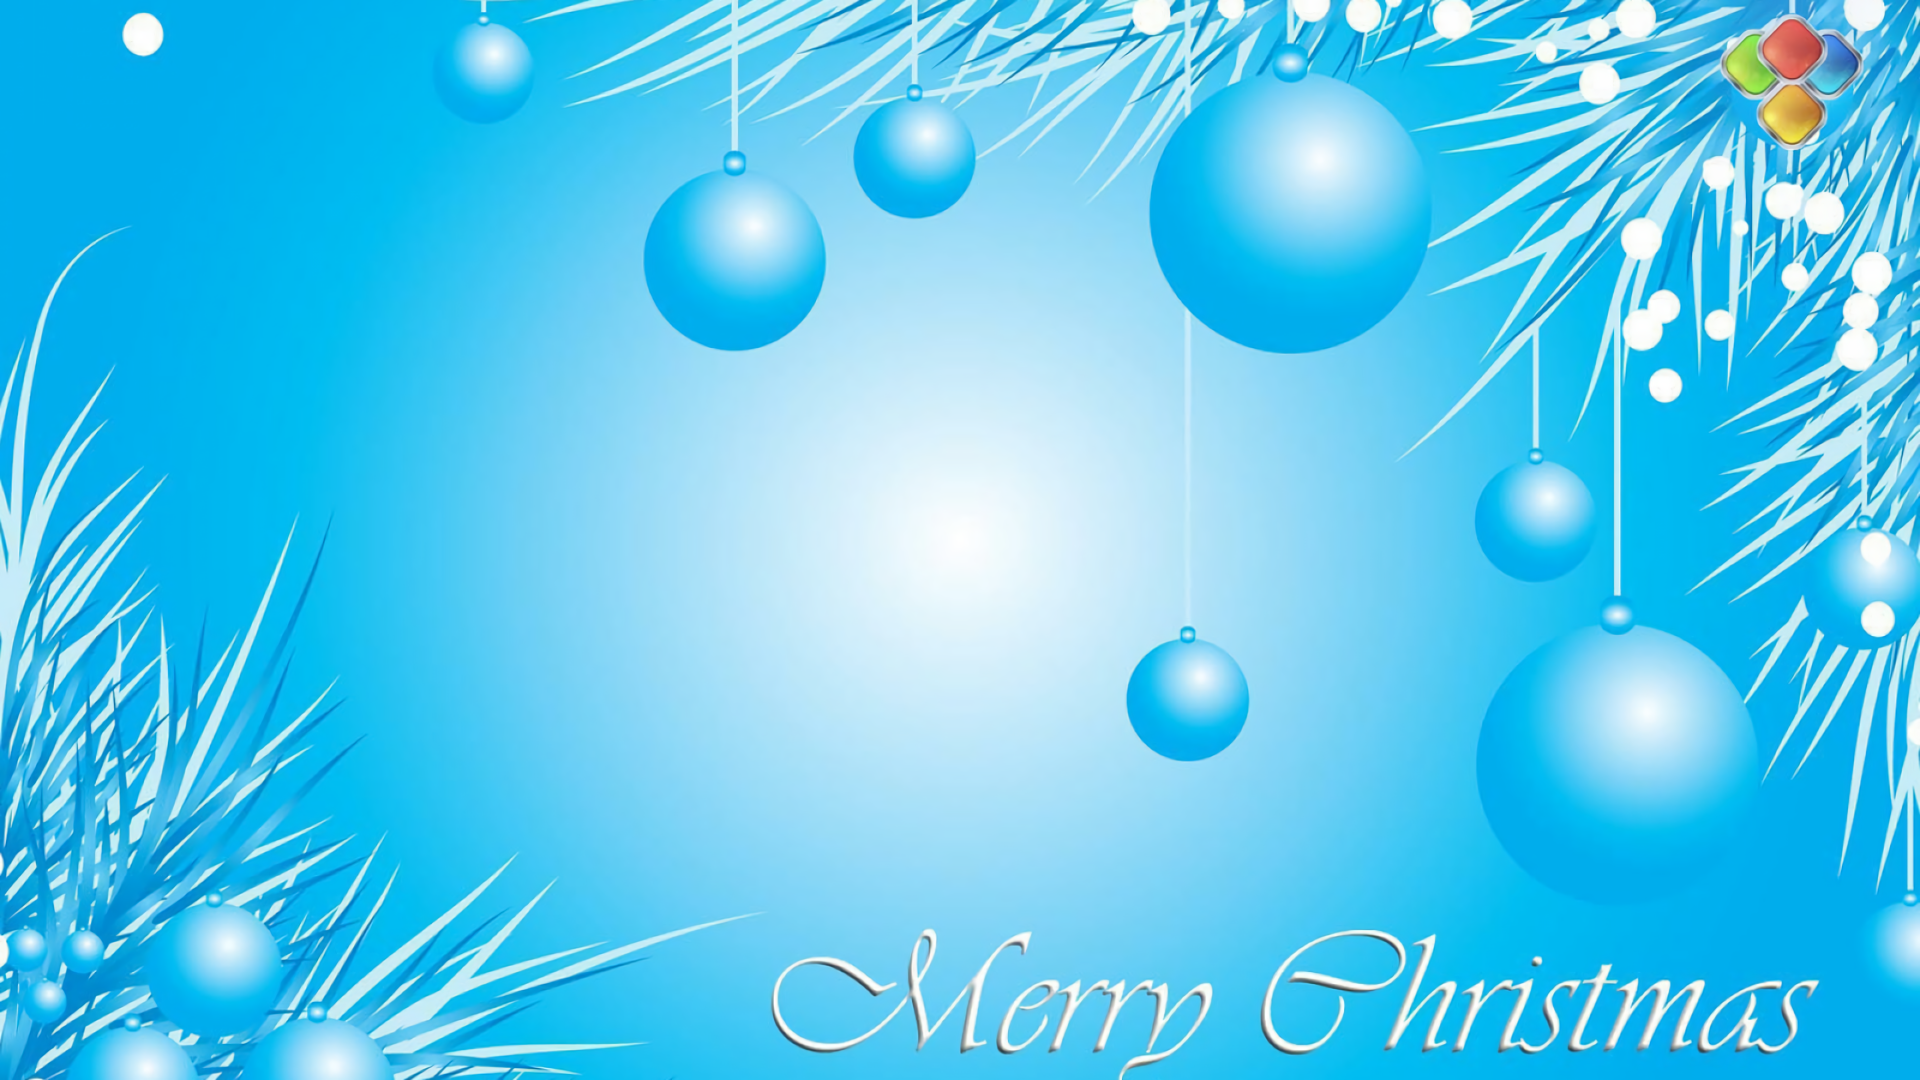 Holiday - Christmas  Holiday Christmas Ornaments Merry Christmas Blue Wallpaper